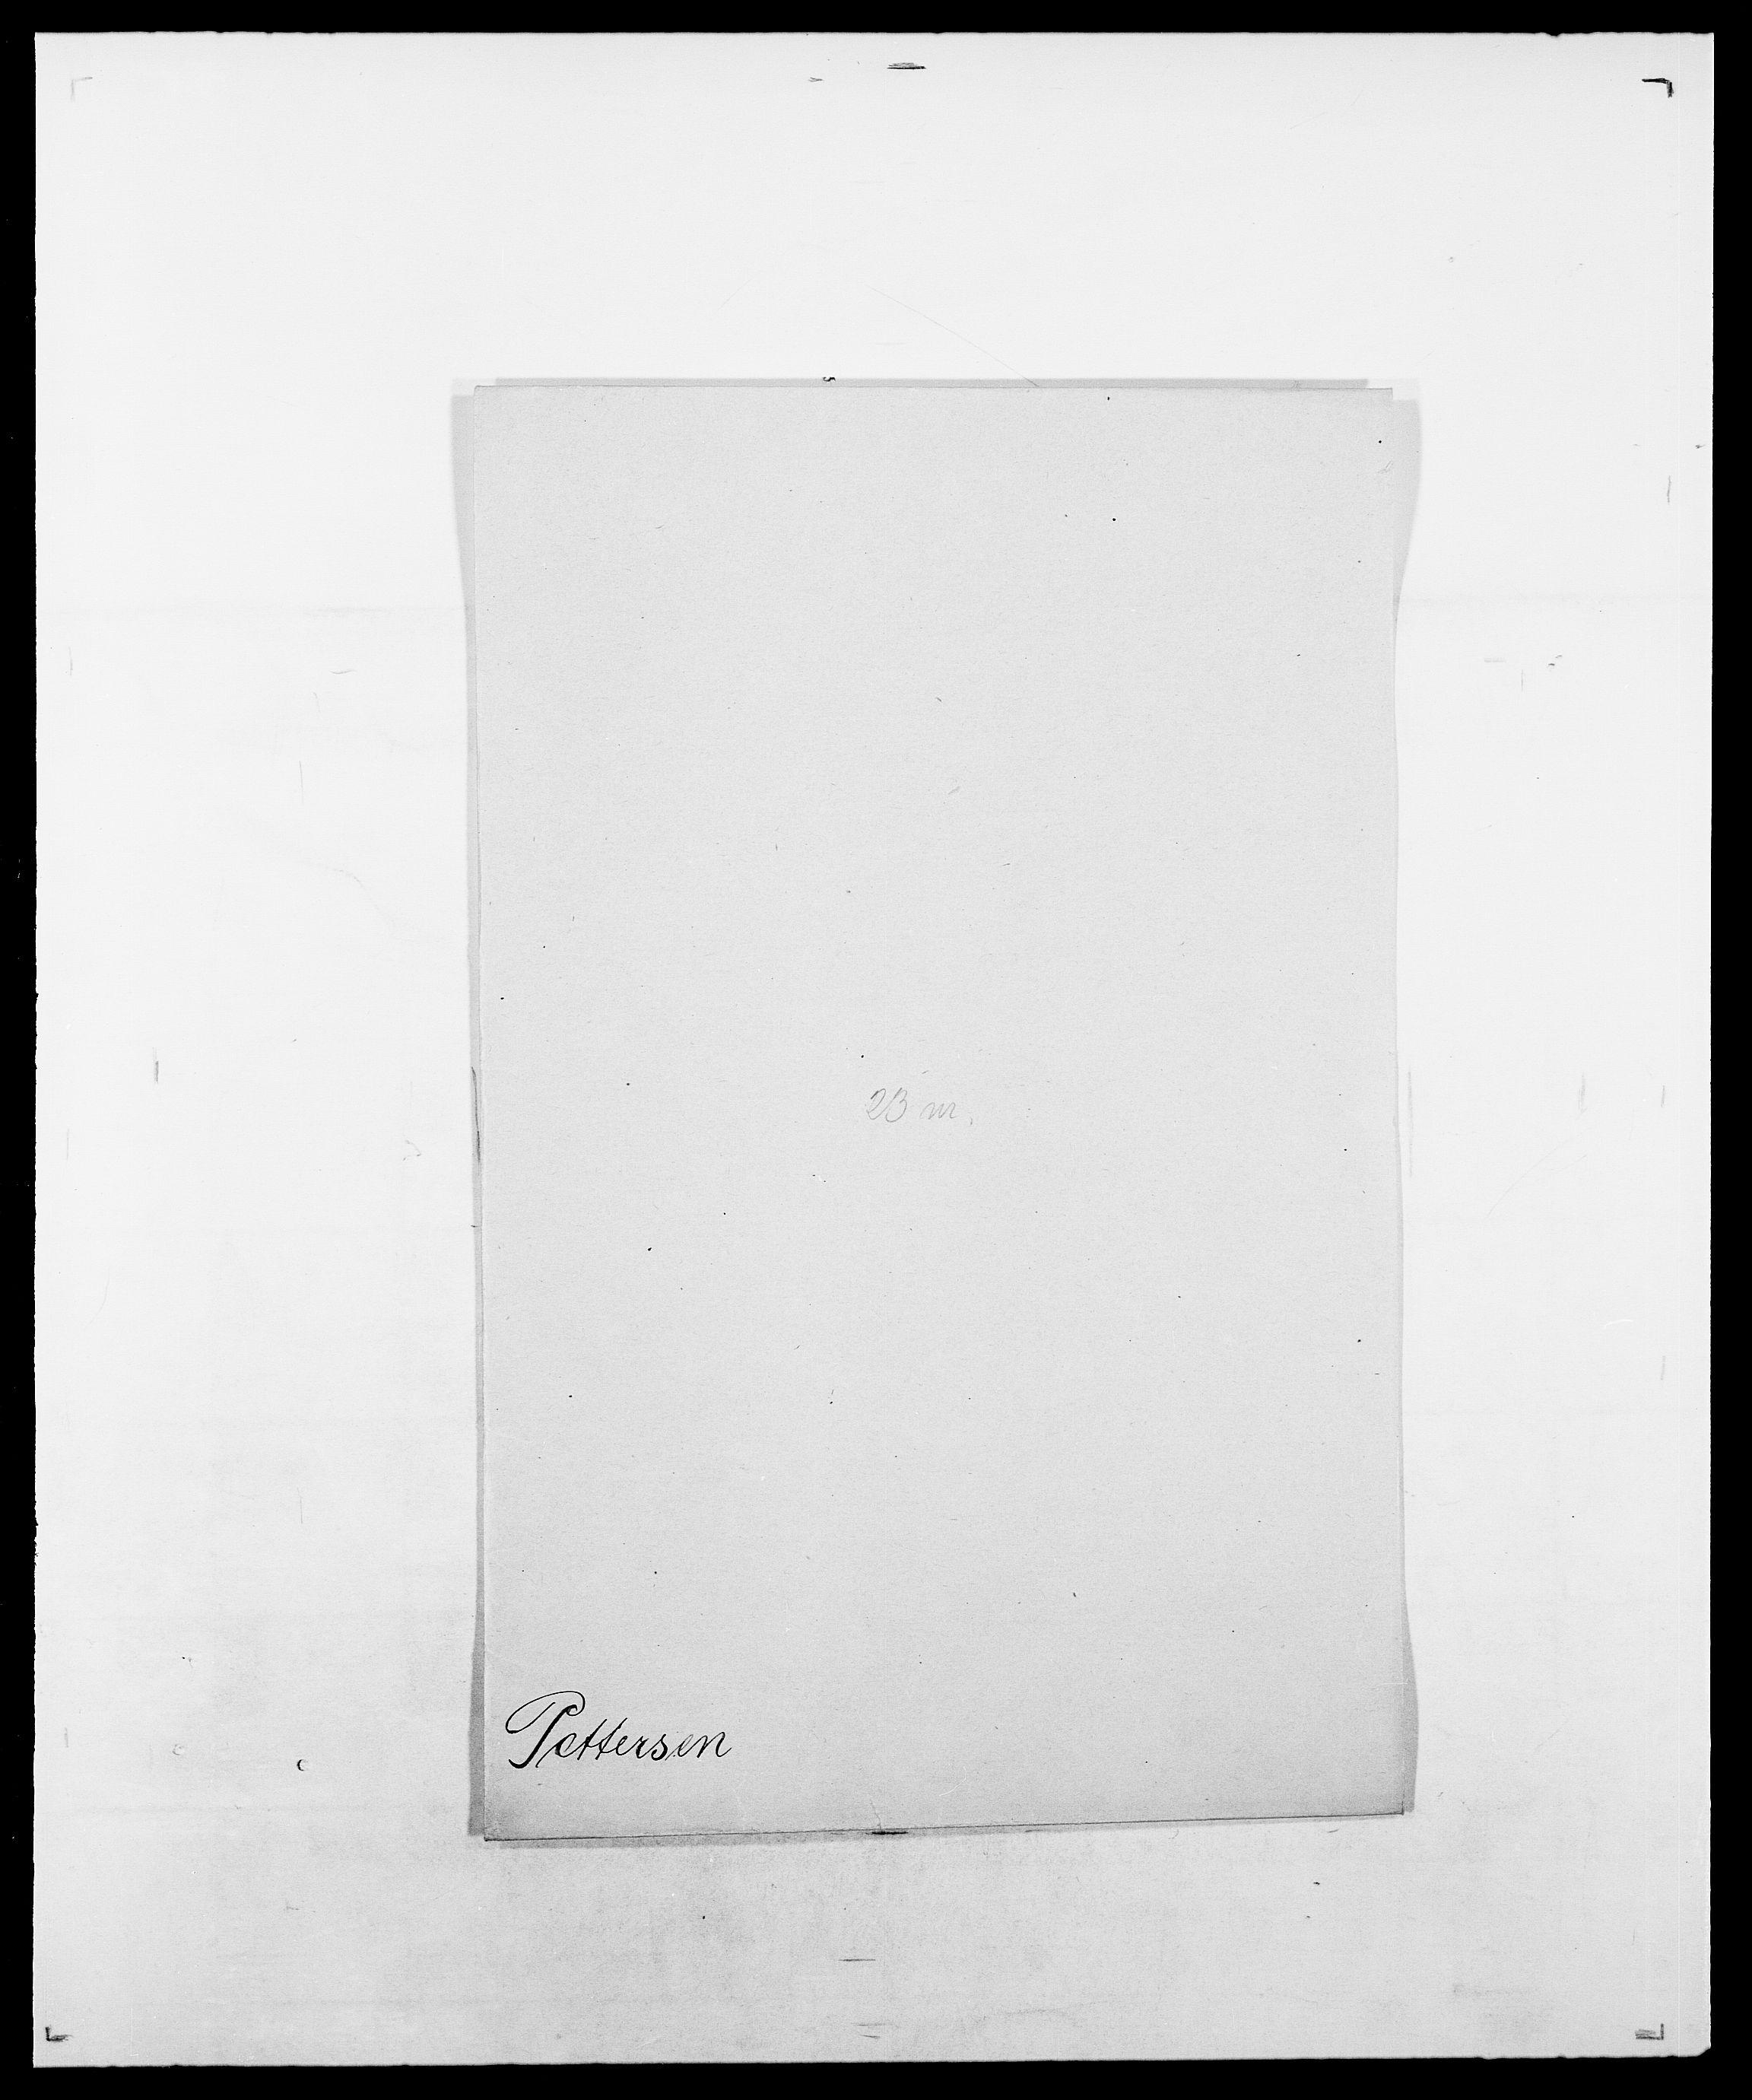 SAO, Delgobe, Charles Antoine - samling, D/Da/L0030: Paars - Pittelkov, s. 467